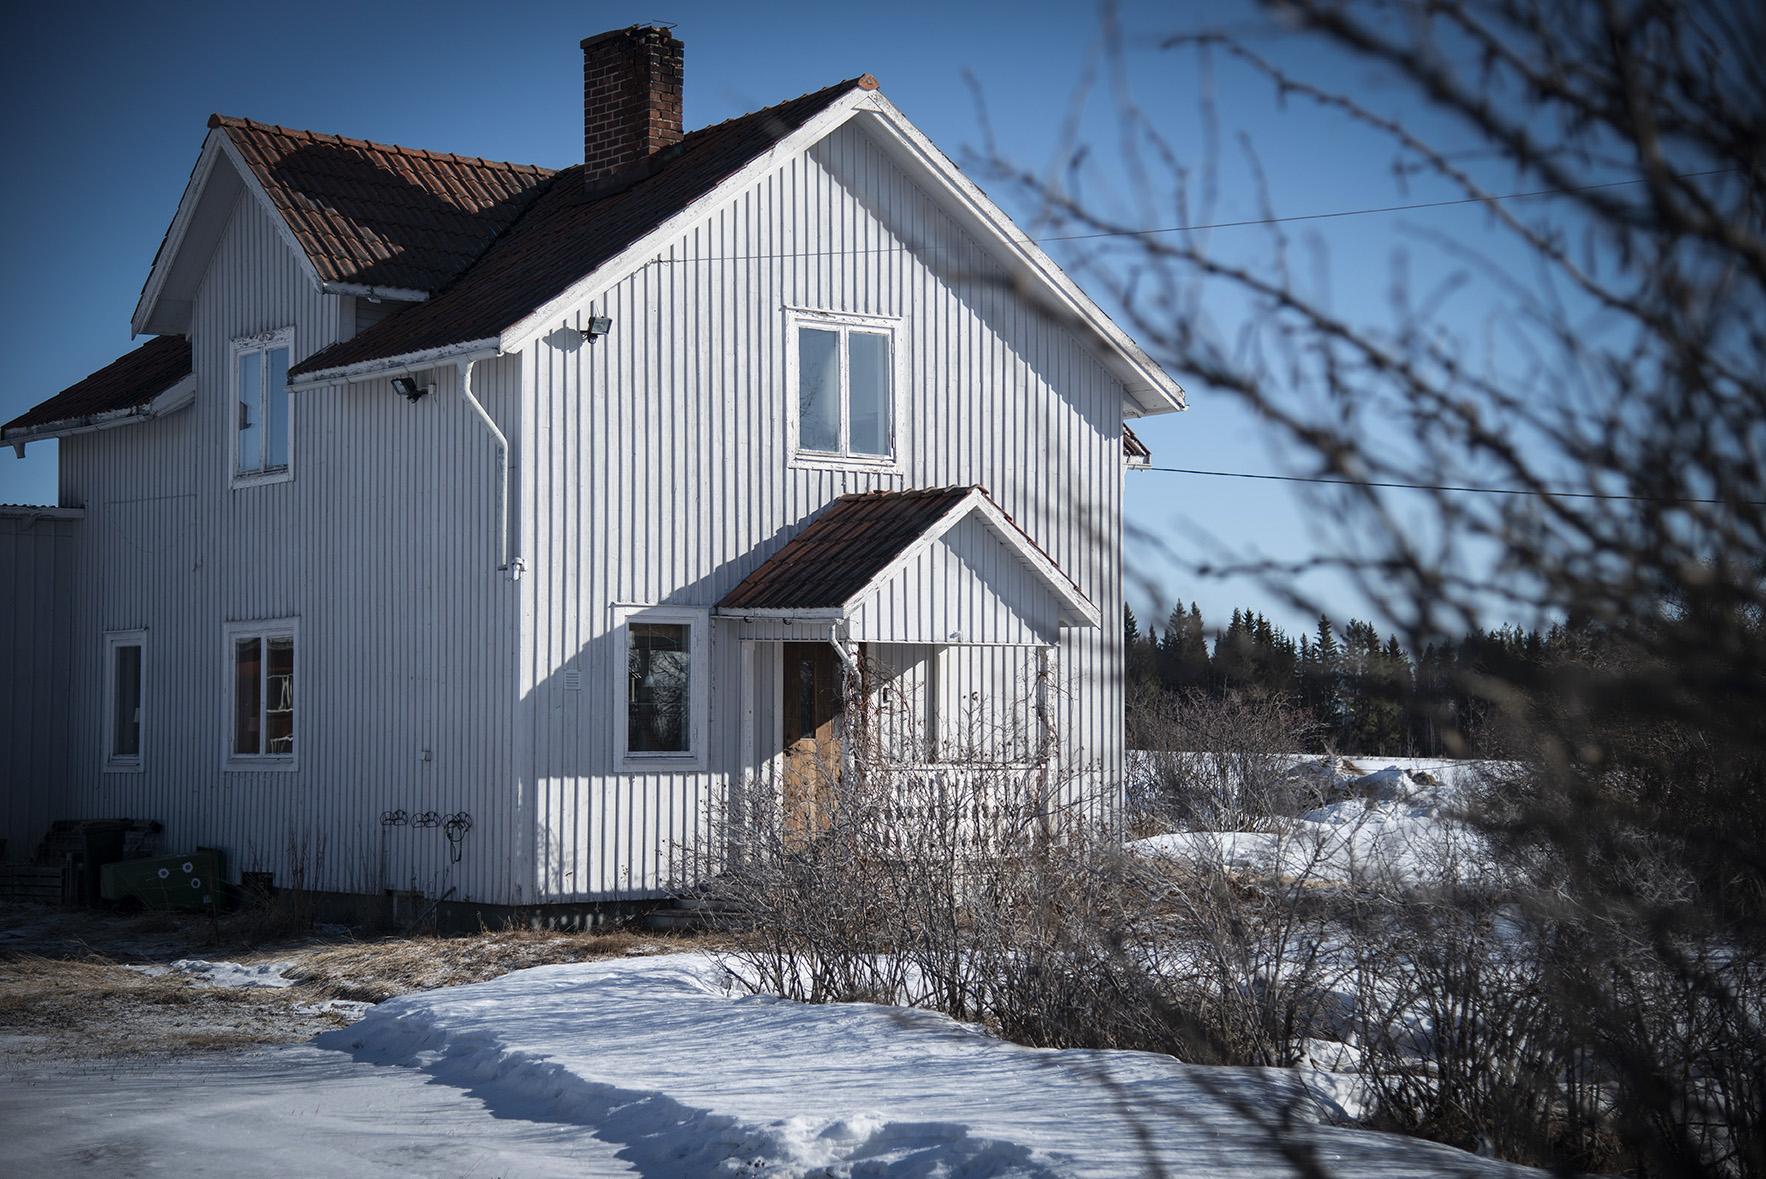 Hus, vinter